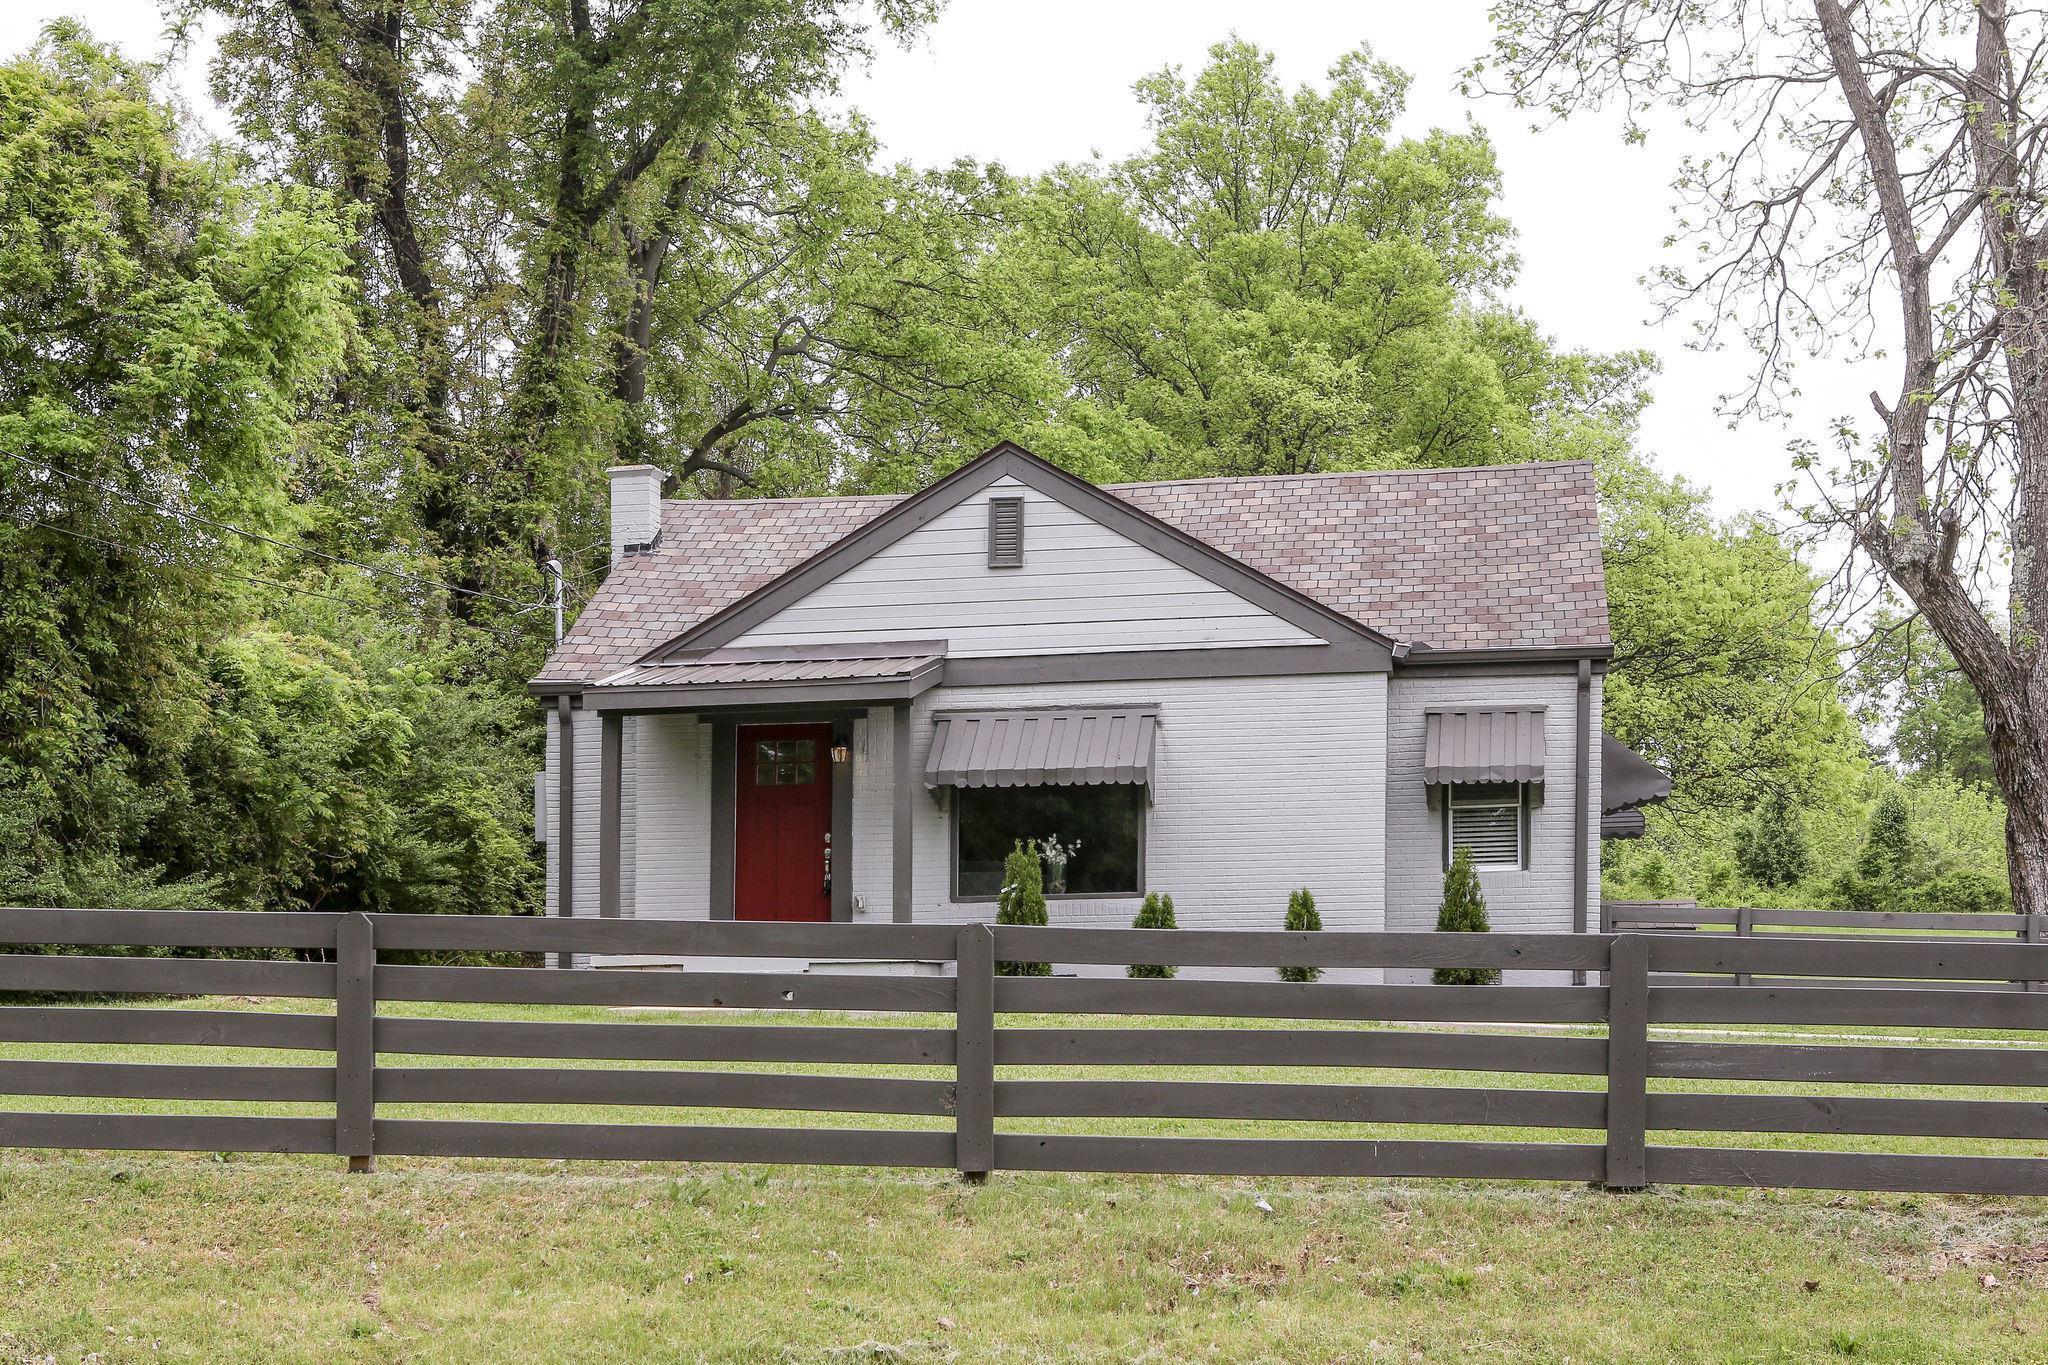 2701 Pennington Bend Rd, Nashville, TN 37214 - Nashville, TN real estate listing